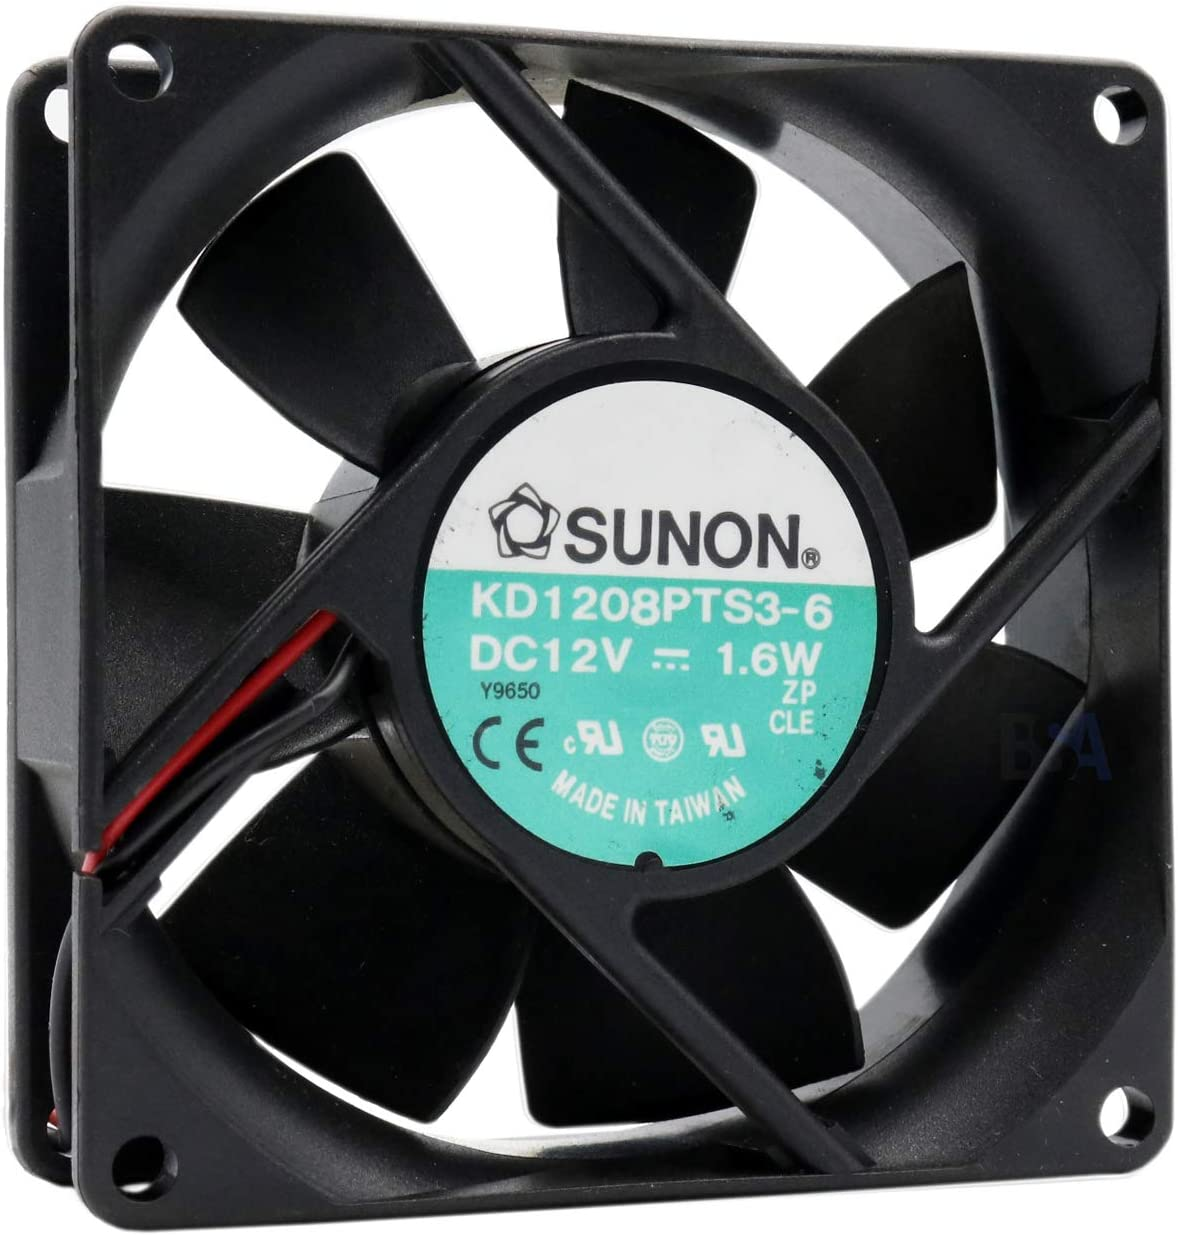 Sunon - Ventilador 80 mm 80 x 80 x 25 KD1208PTS3-6 12 V DC 0,13 A ...